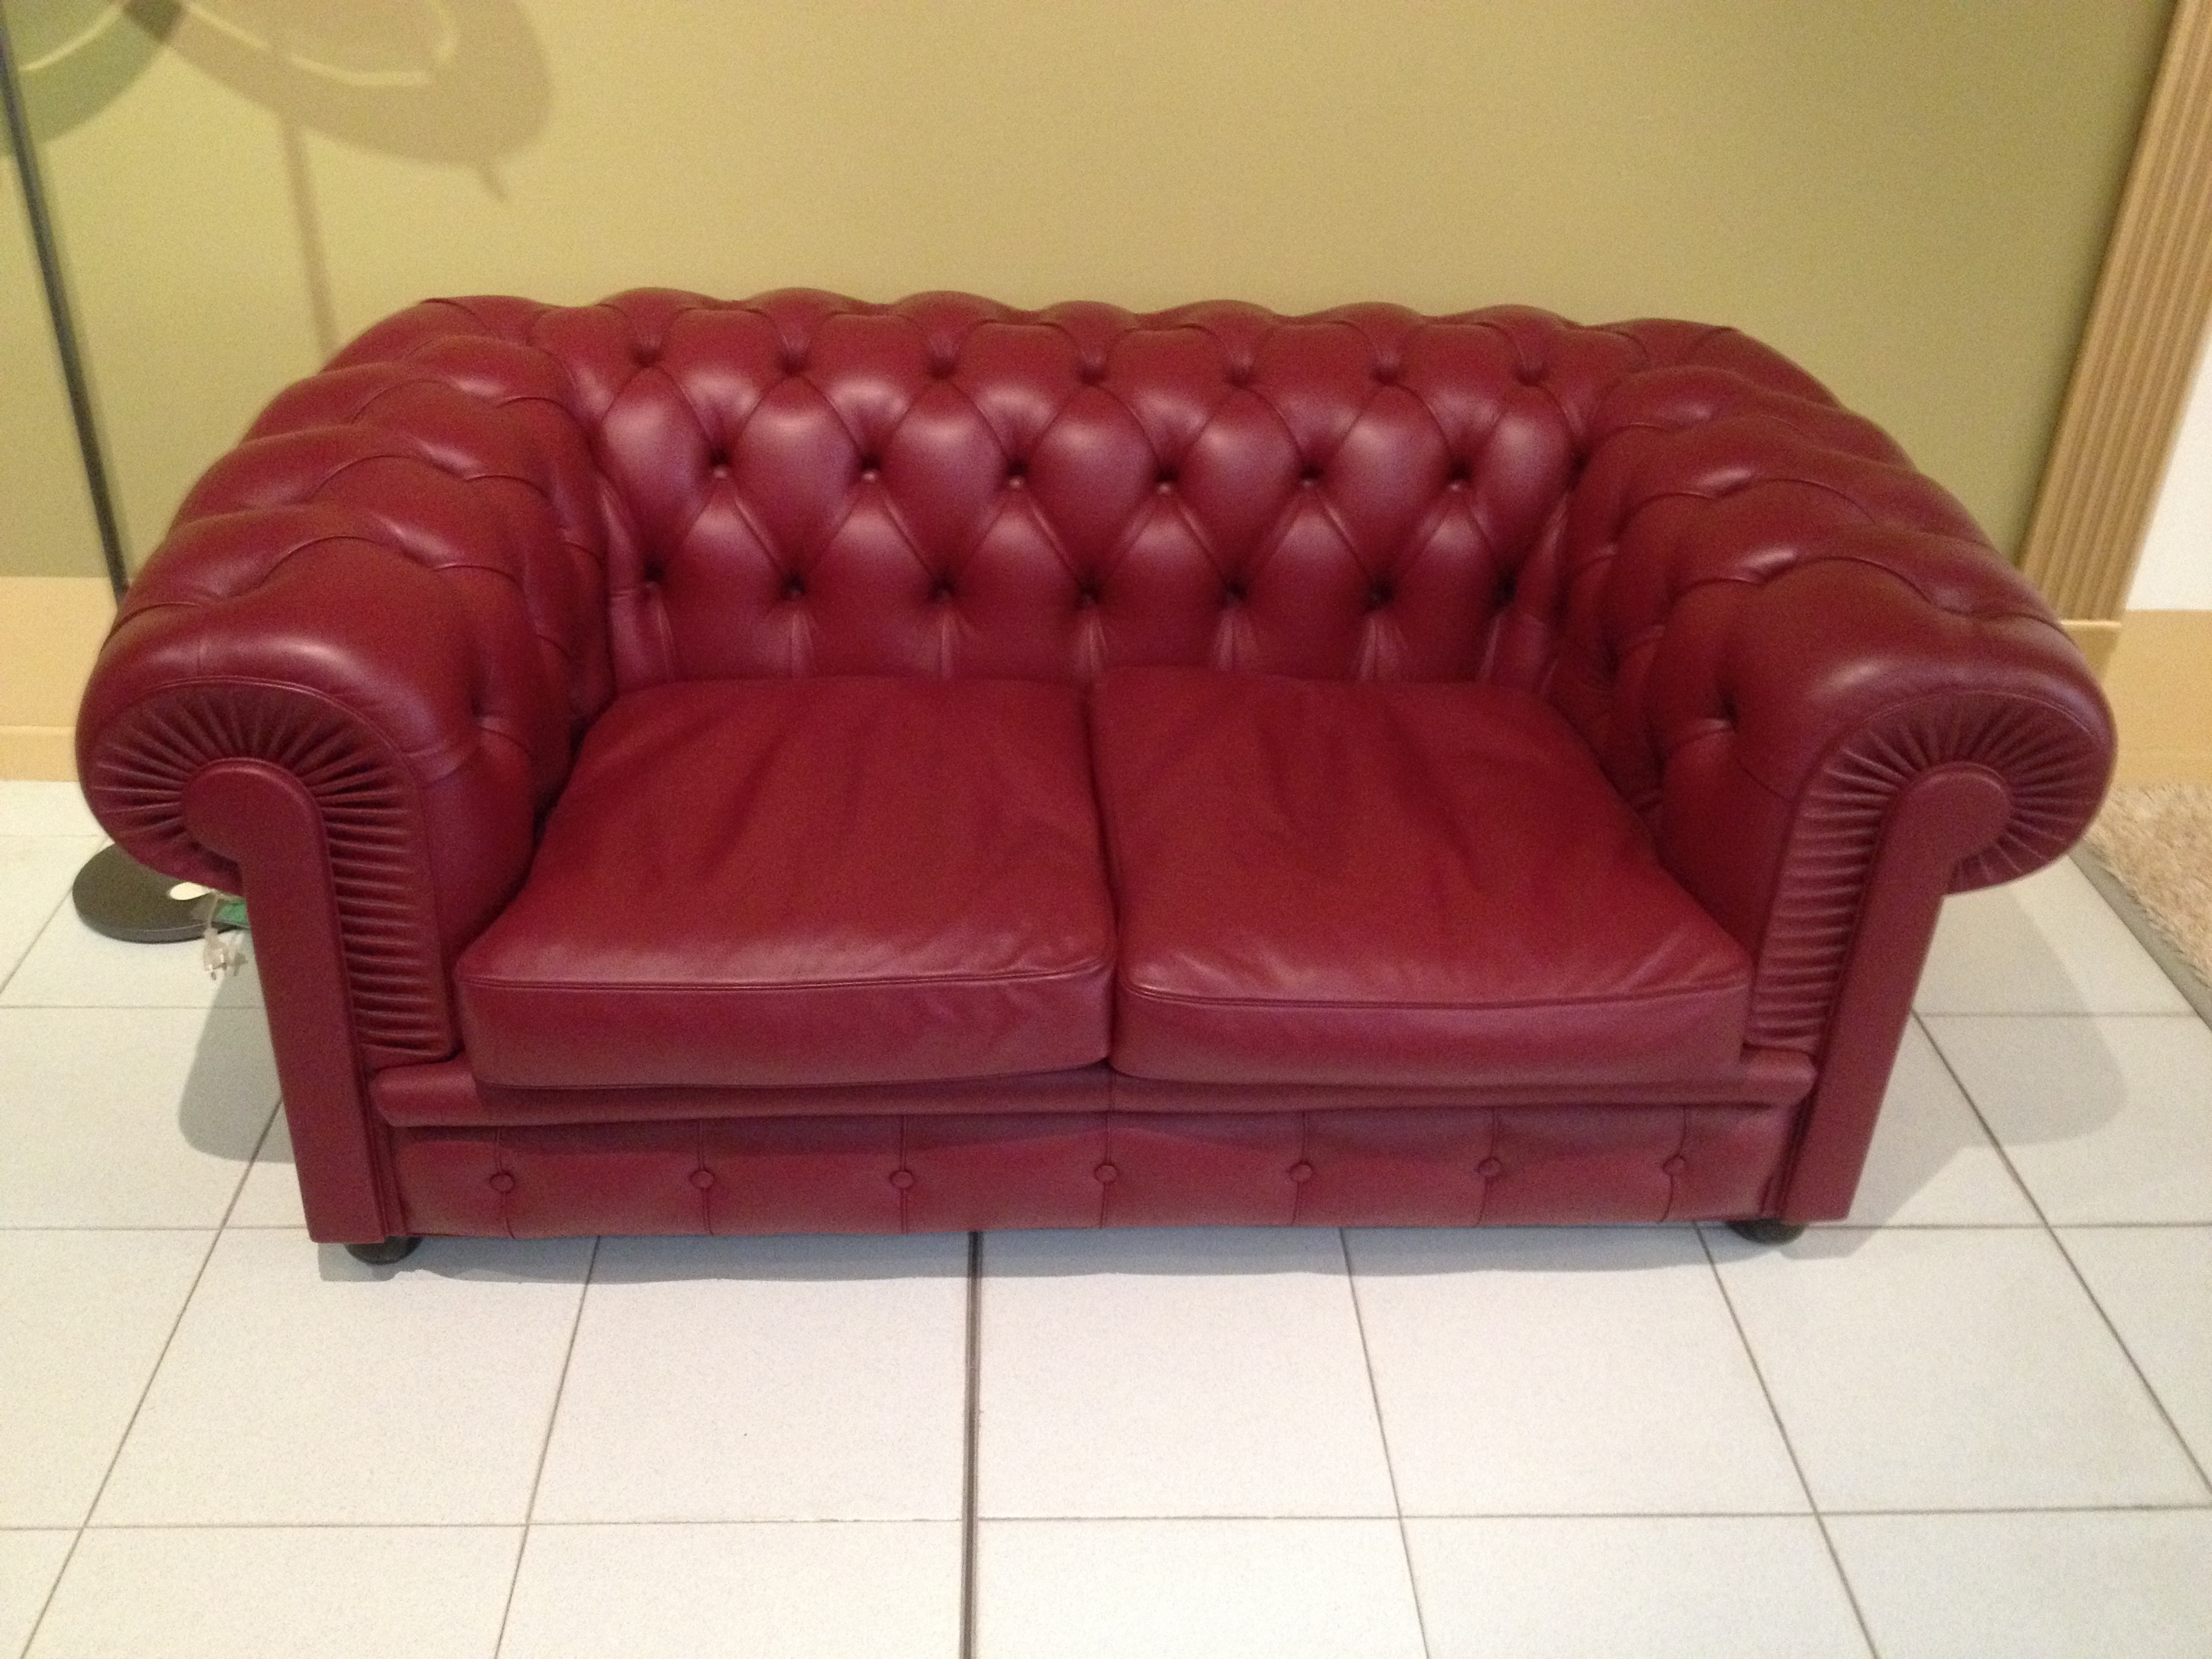 Frau divano modello chester met prezzo divani a prezzi scontati - Divano frau prezzi ...